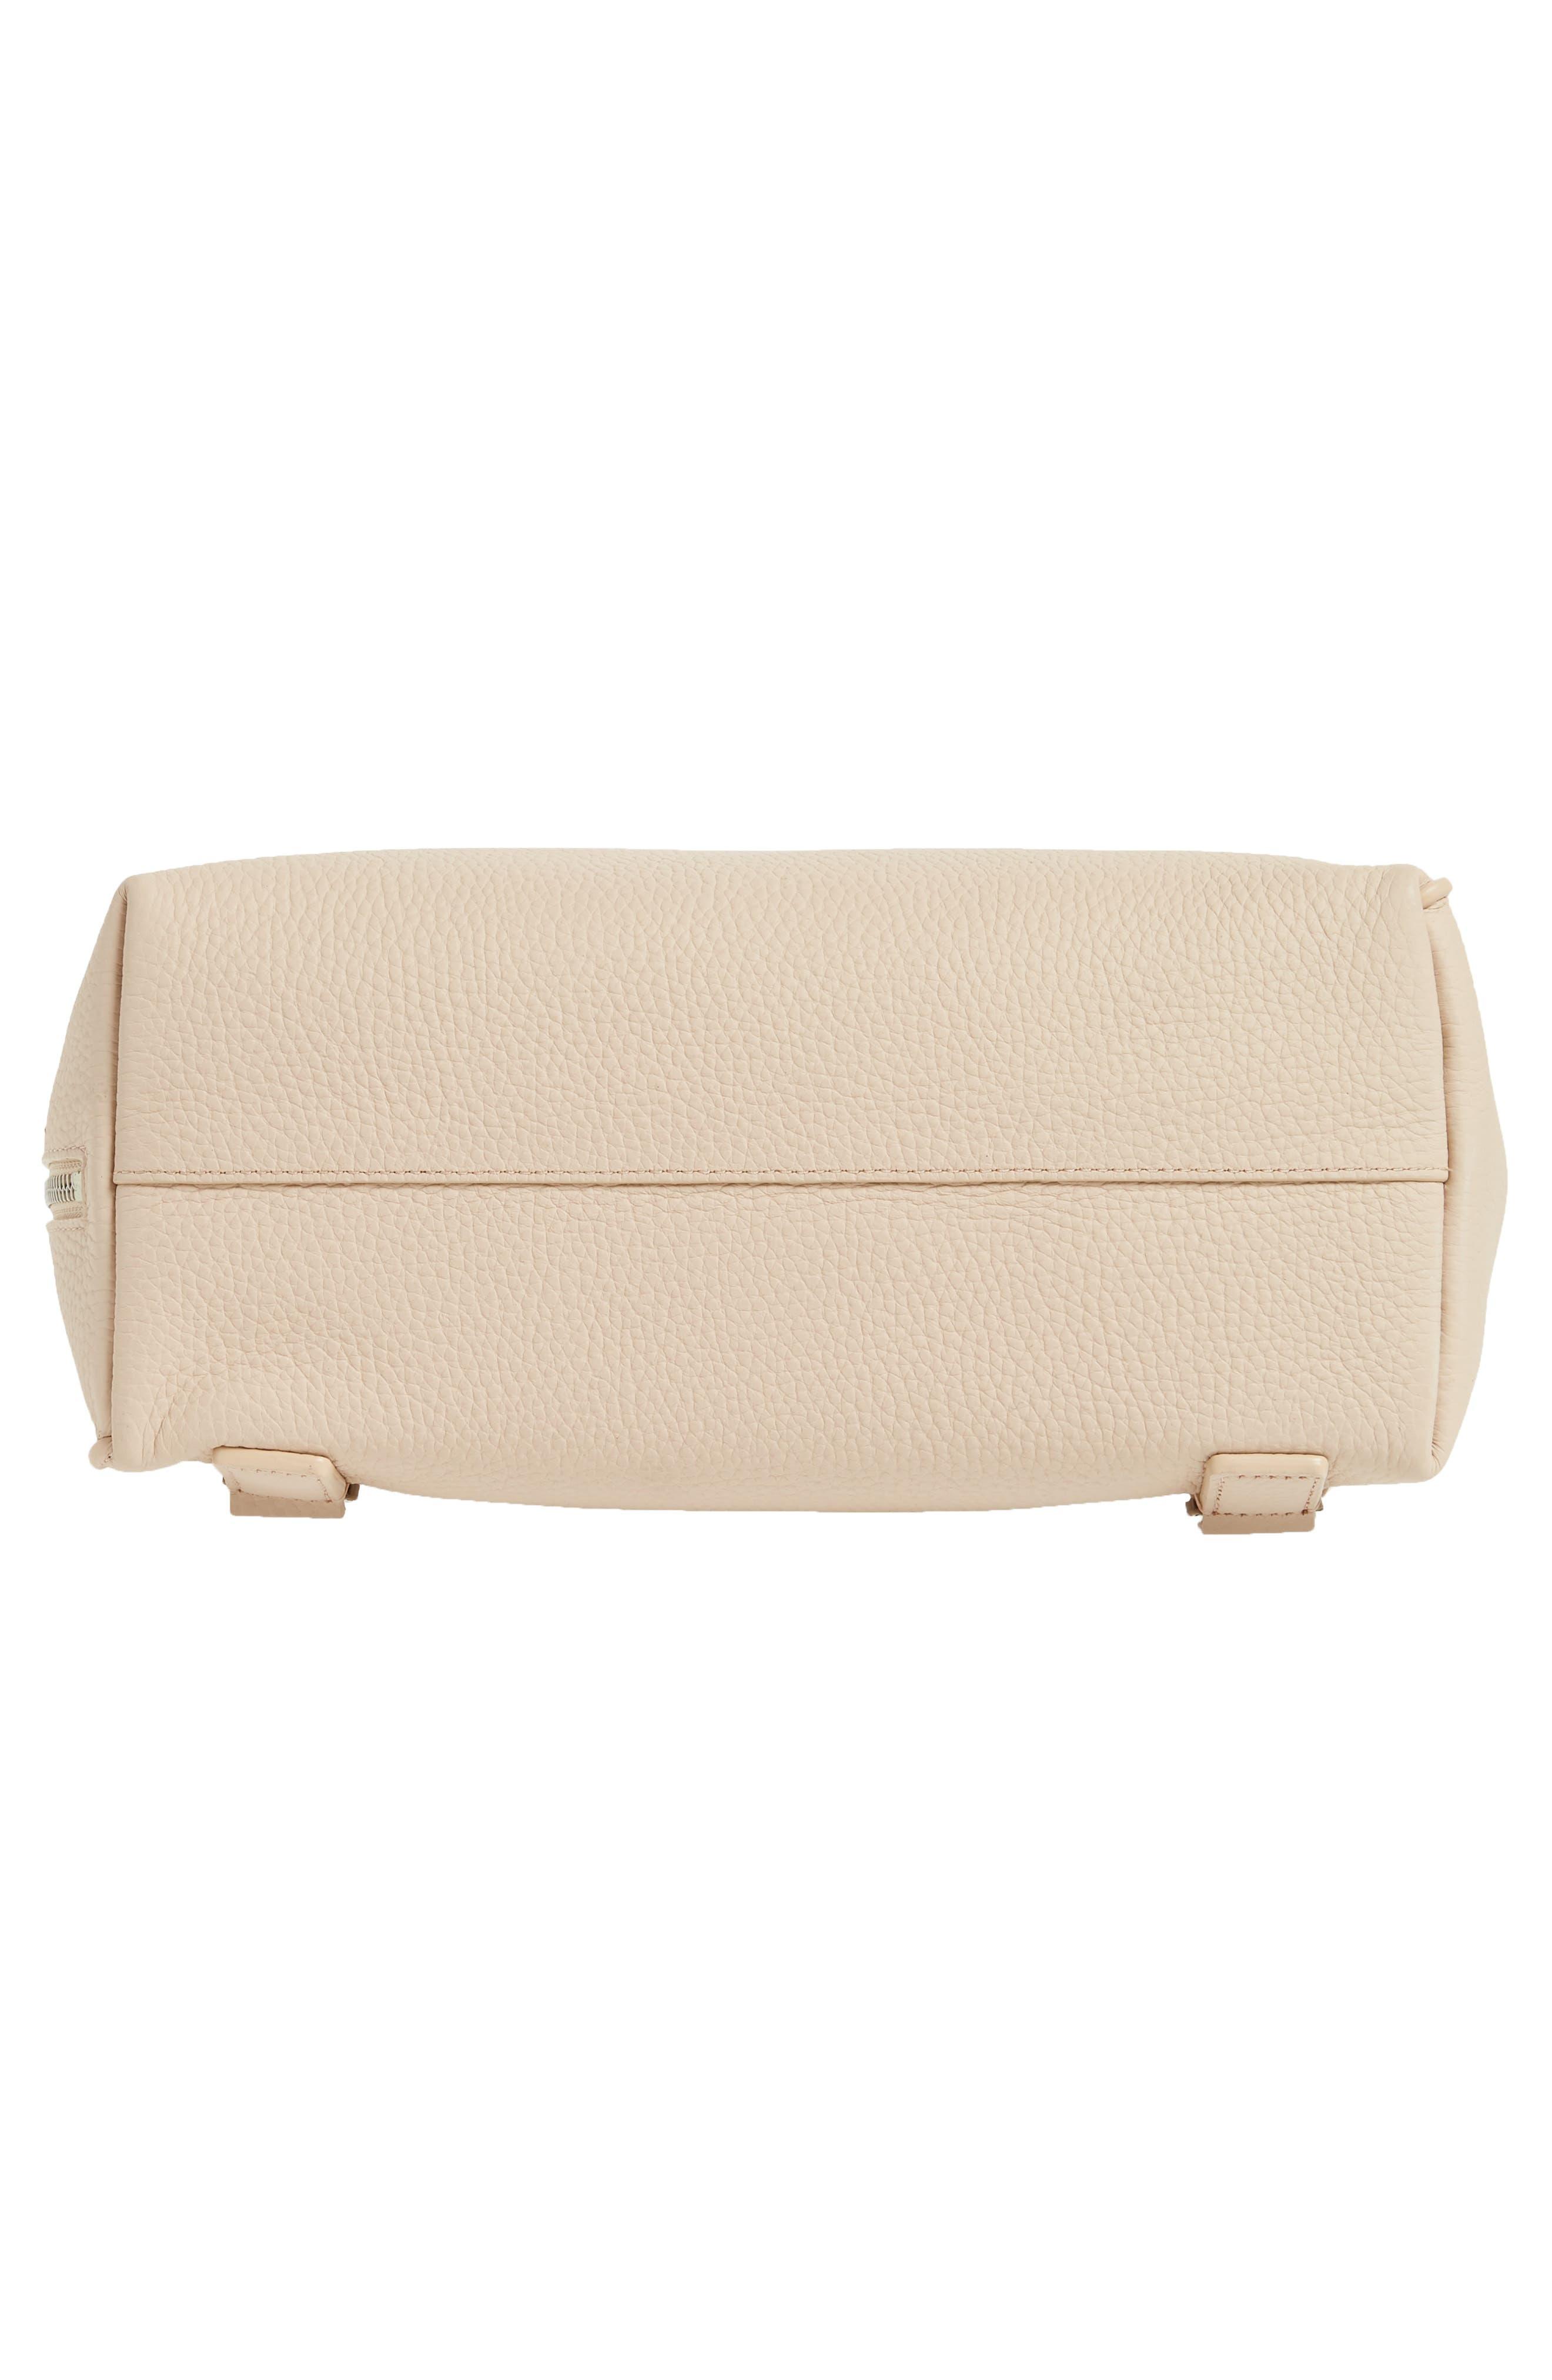 Small Kita Convertible Leather Backpack,                             Alternate thumbnail 6, color,                             Natural